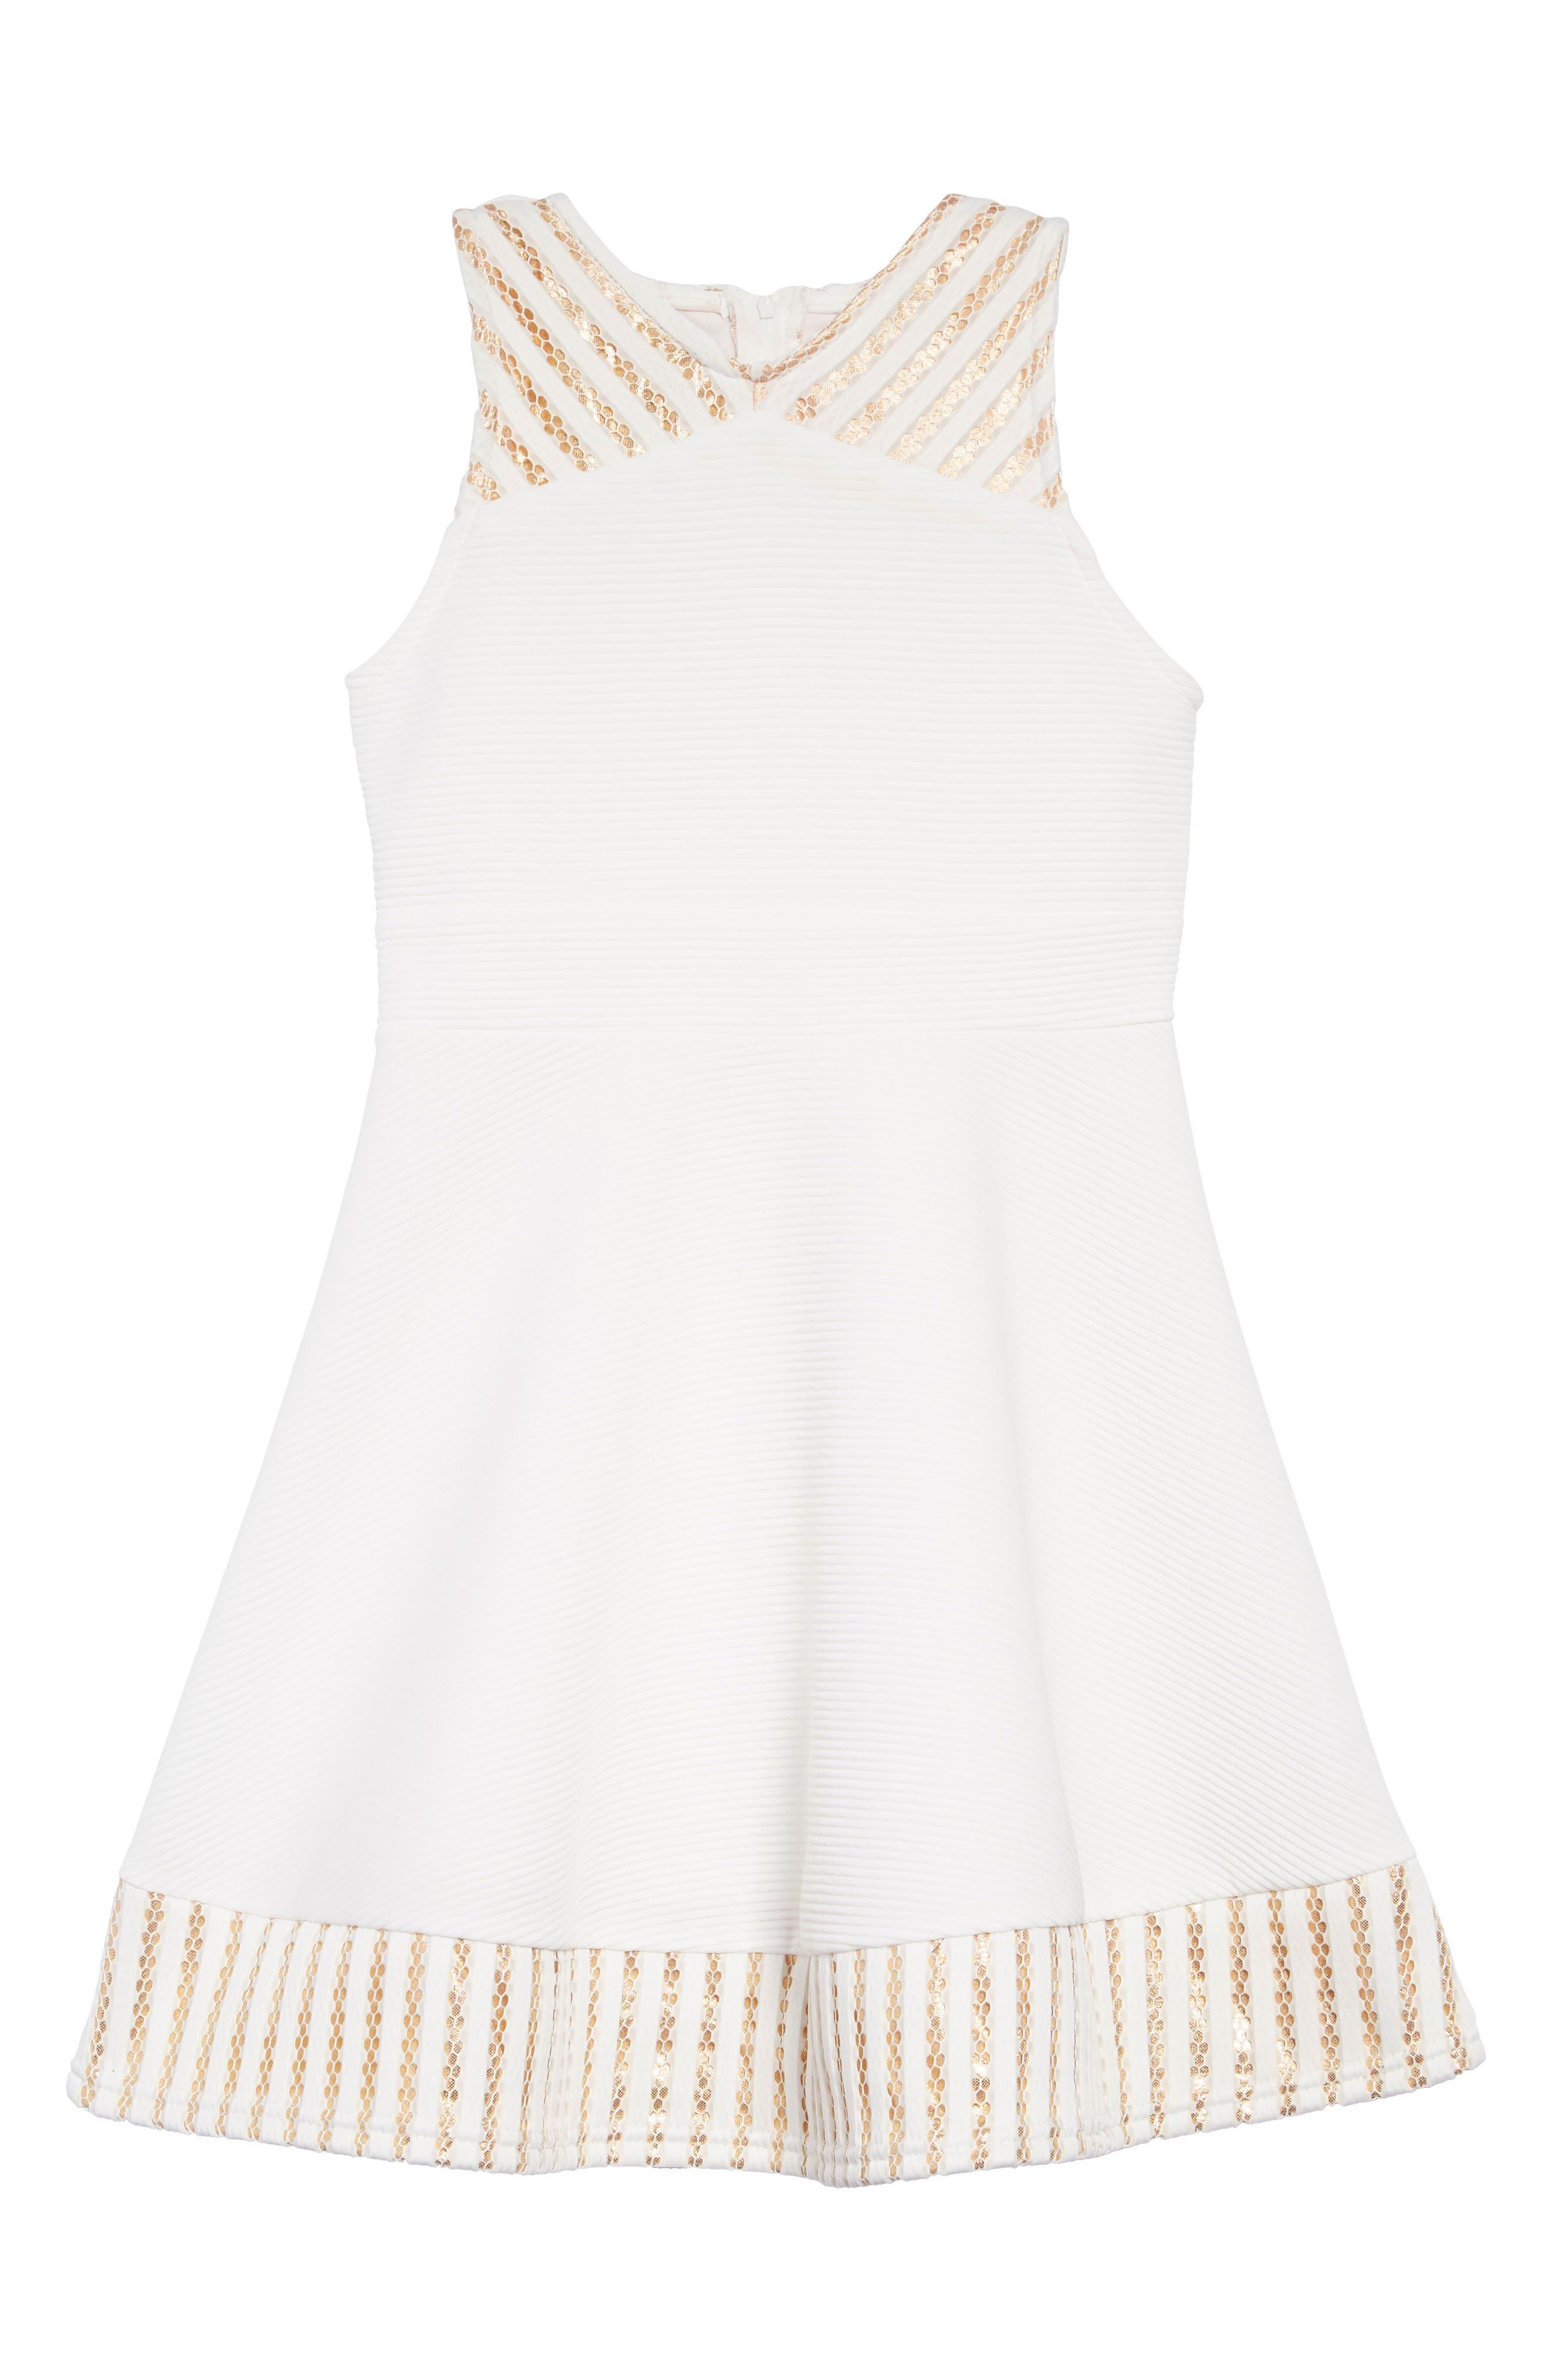 ZUNIE Metallic Trim Ribbed Skater Dress, Main, color, WHITE/GOLD